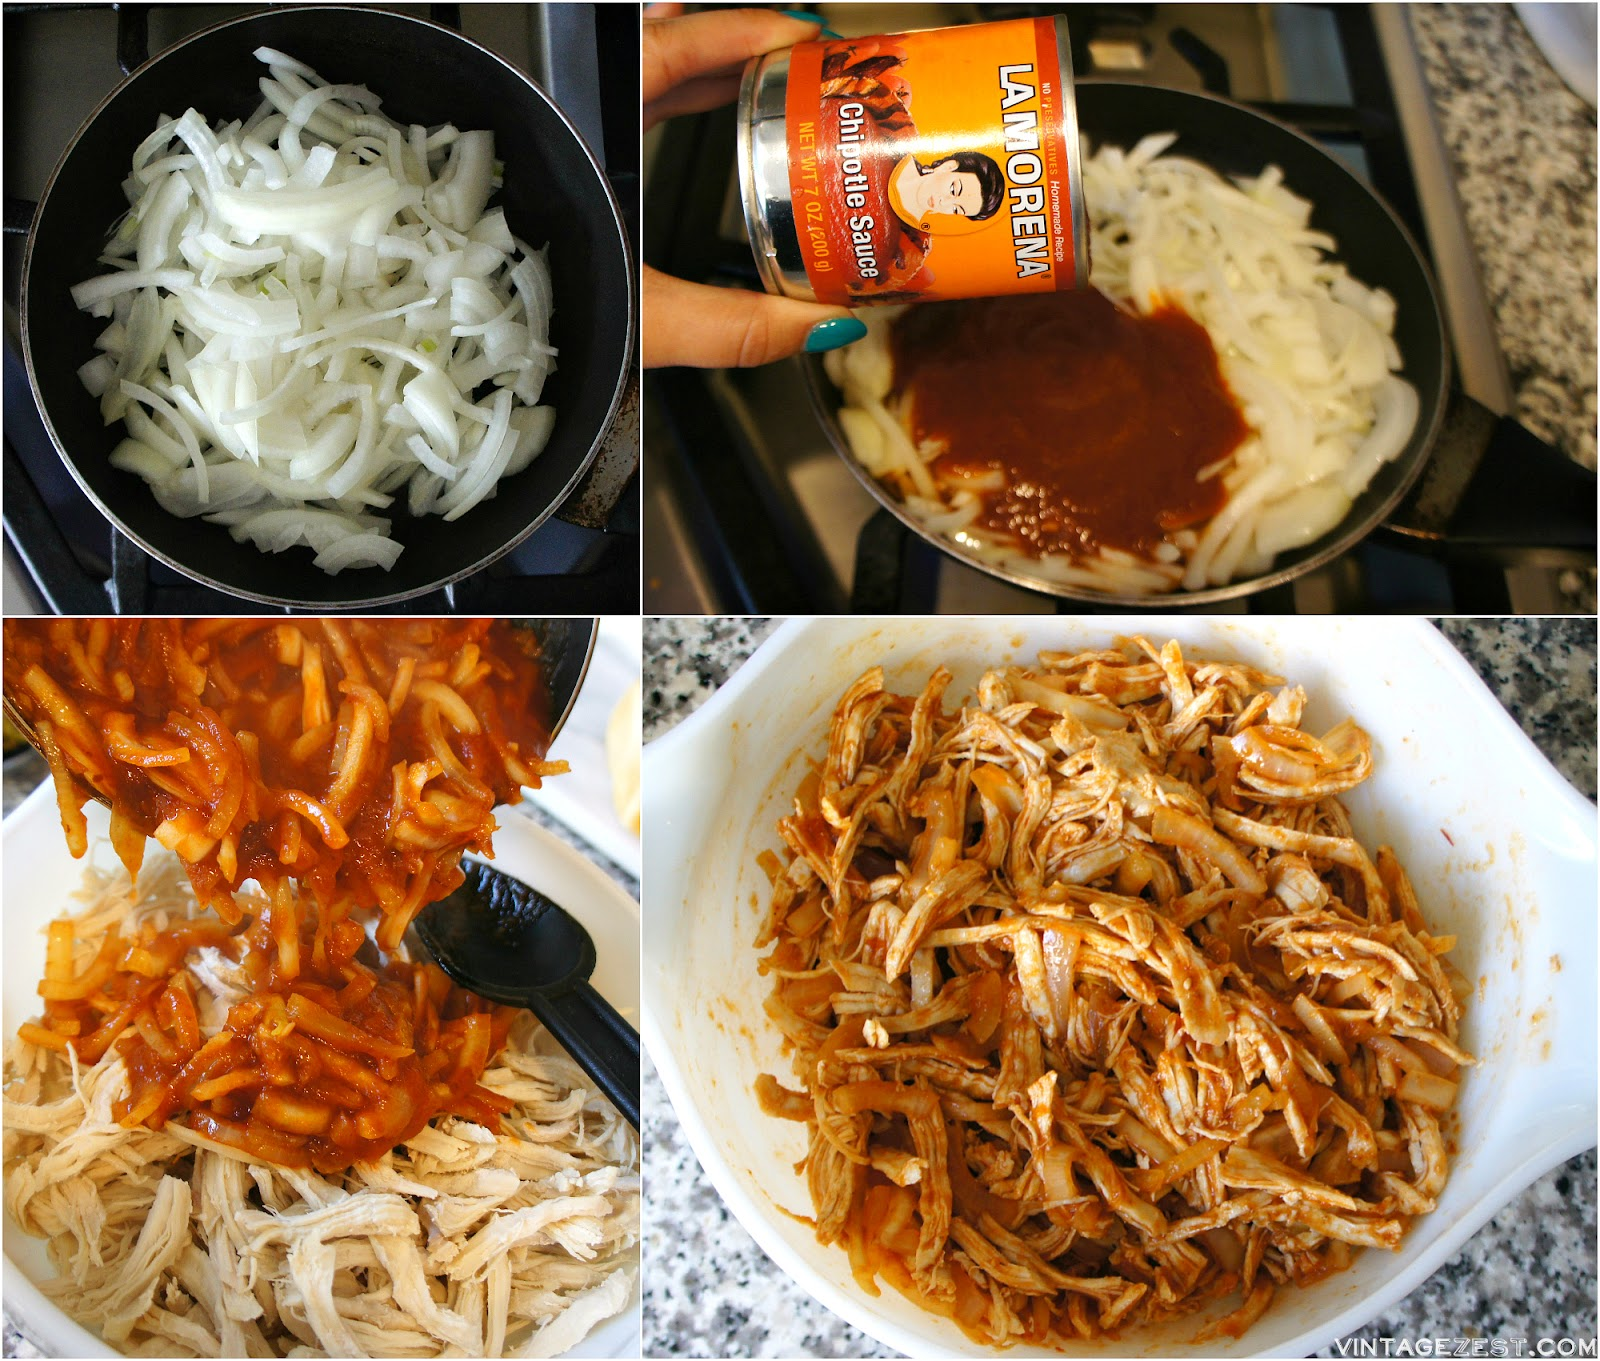 Spicy Chipotle Chicken Sliders recipe on Diane's Vintage Zest!  #ad #VivaLaMorena